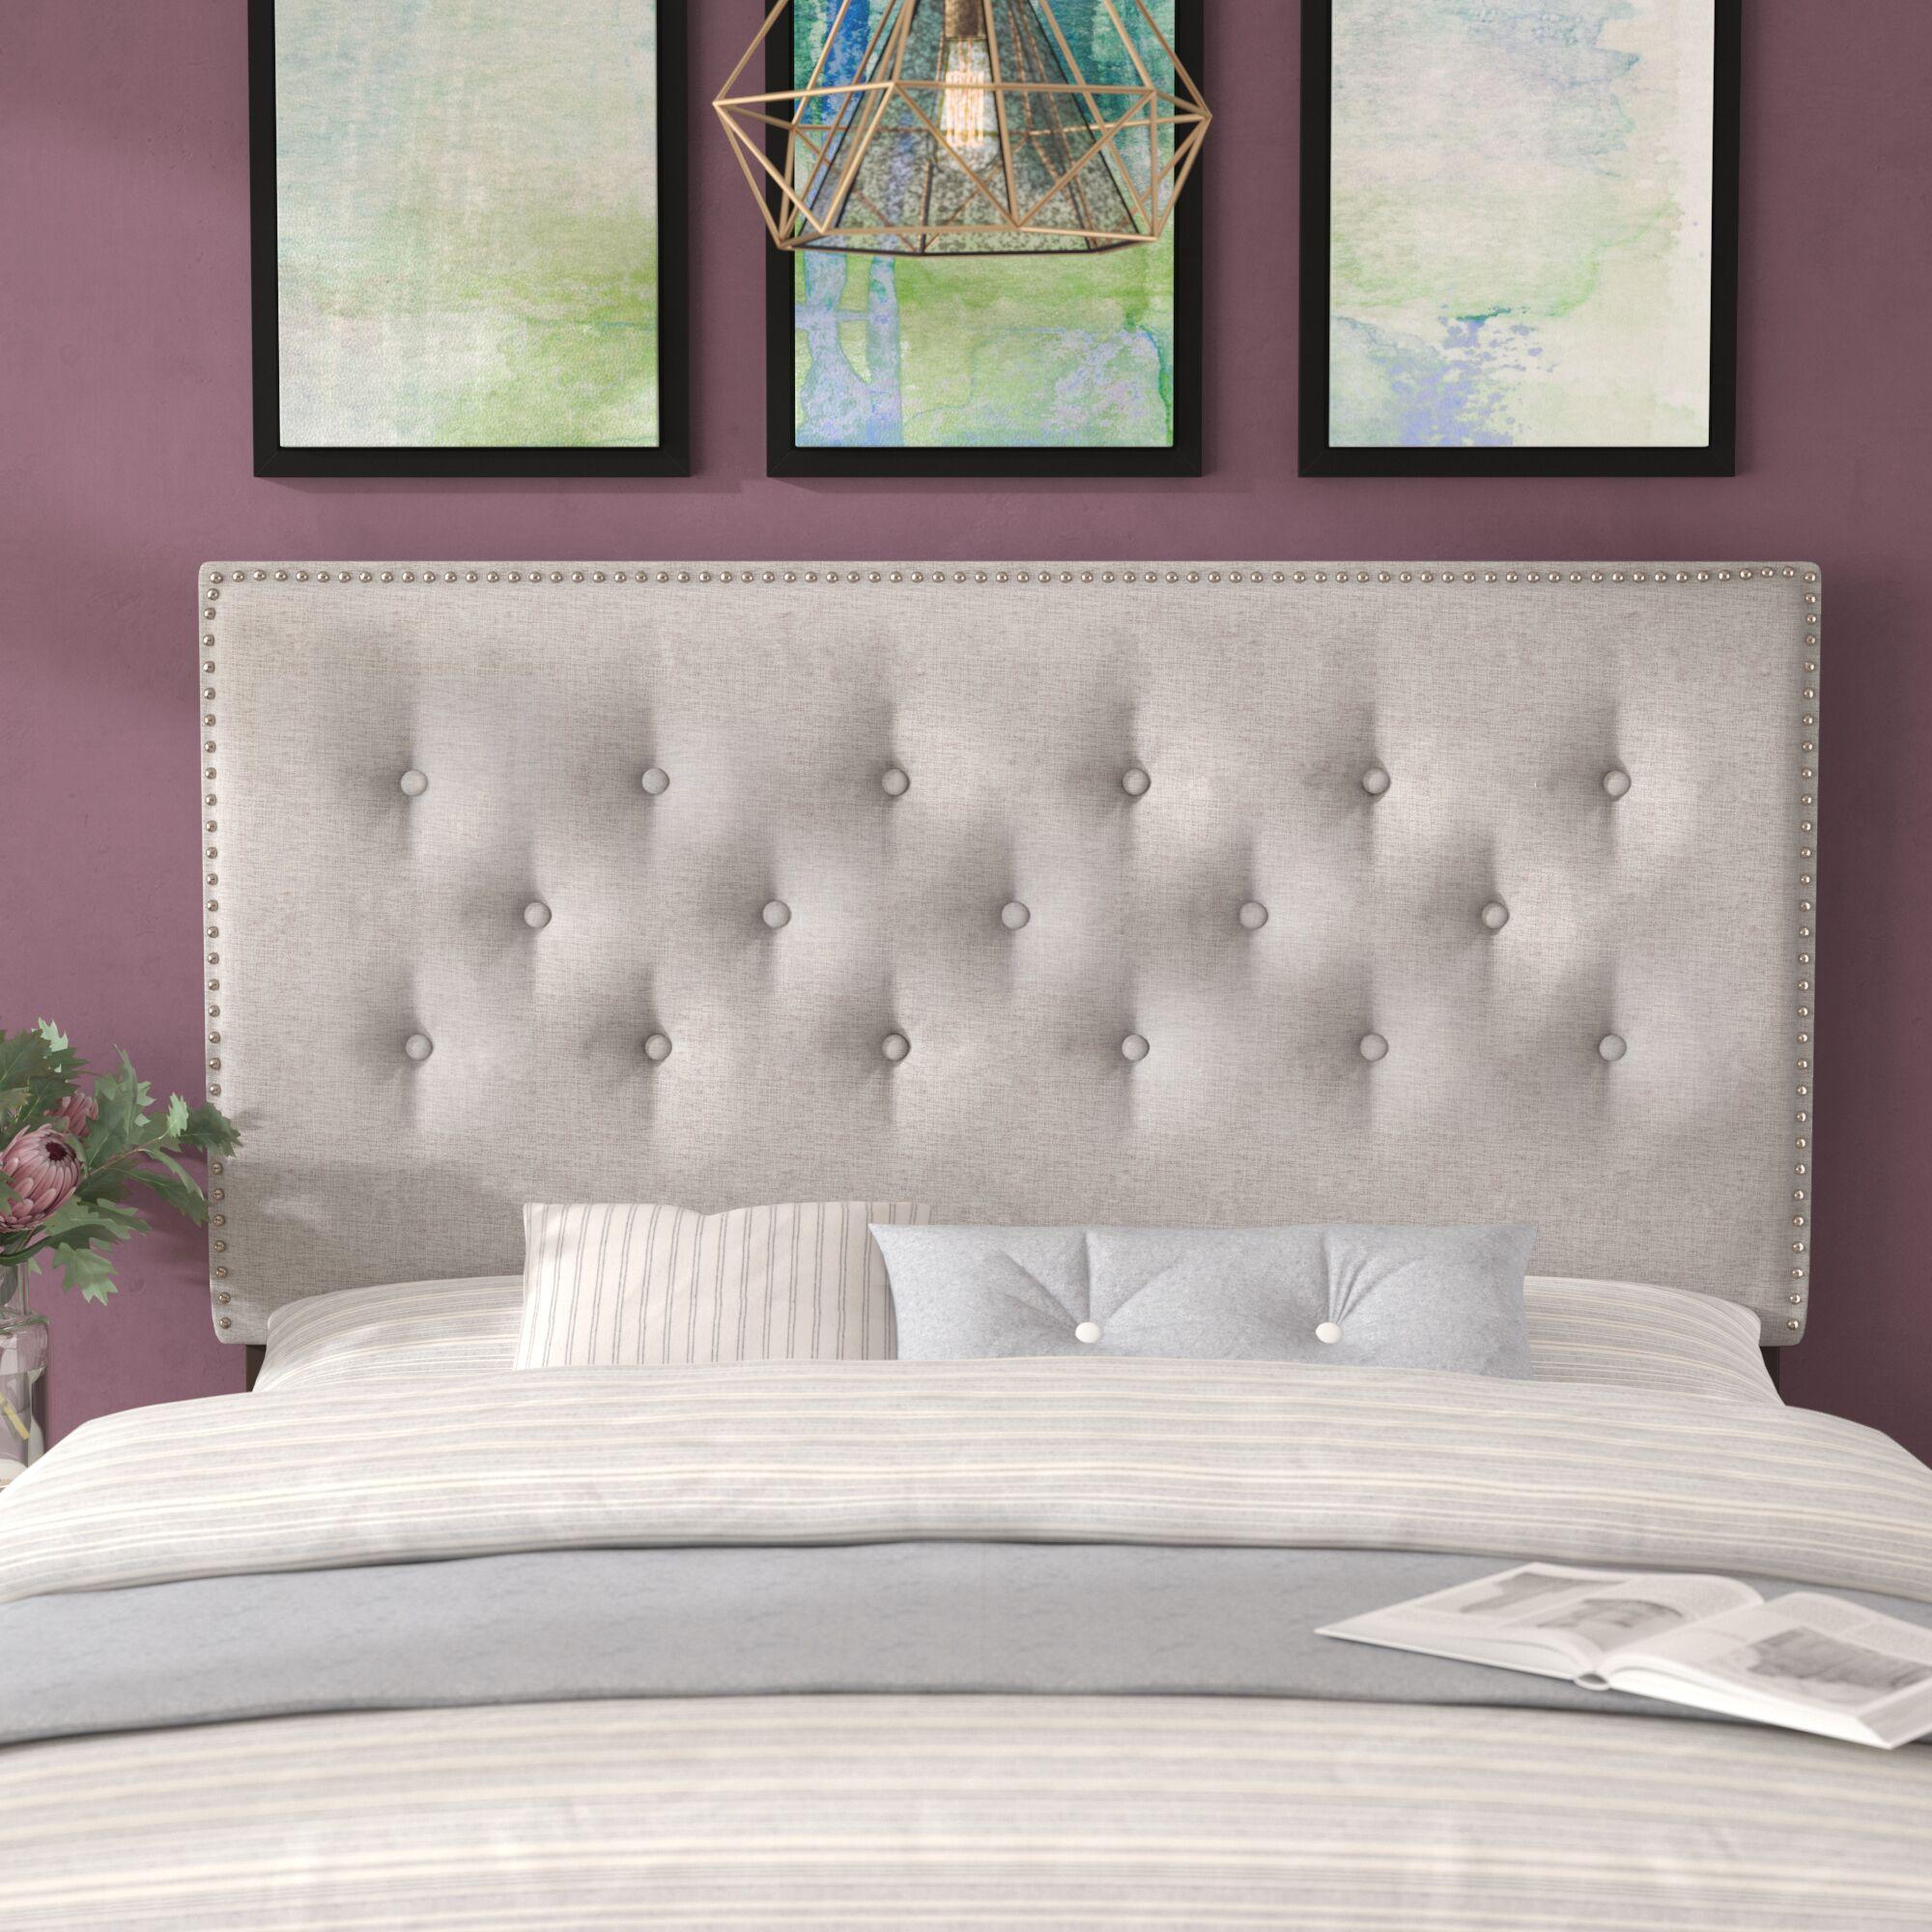 Planas Upholstered Panel Headboard Color: Beige, Size: King